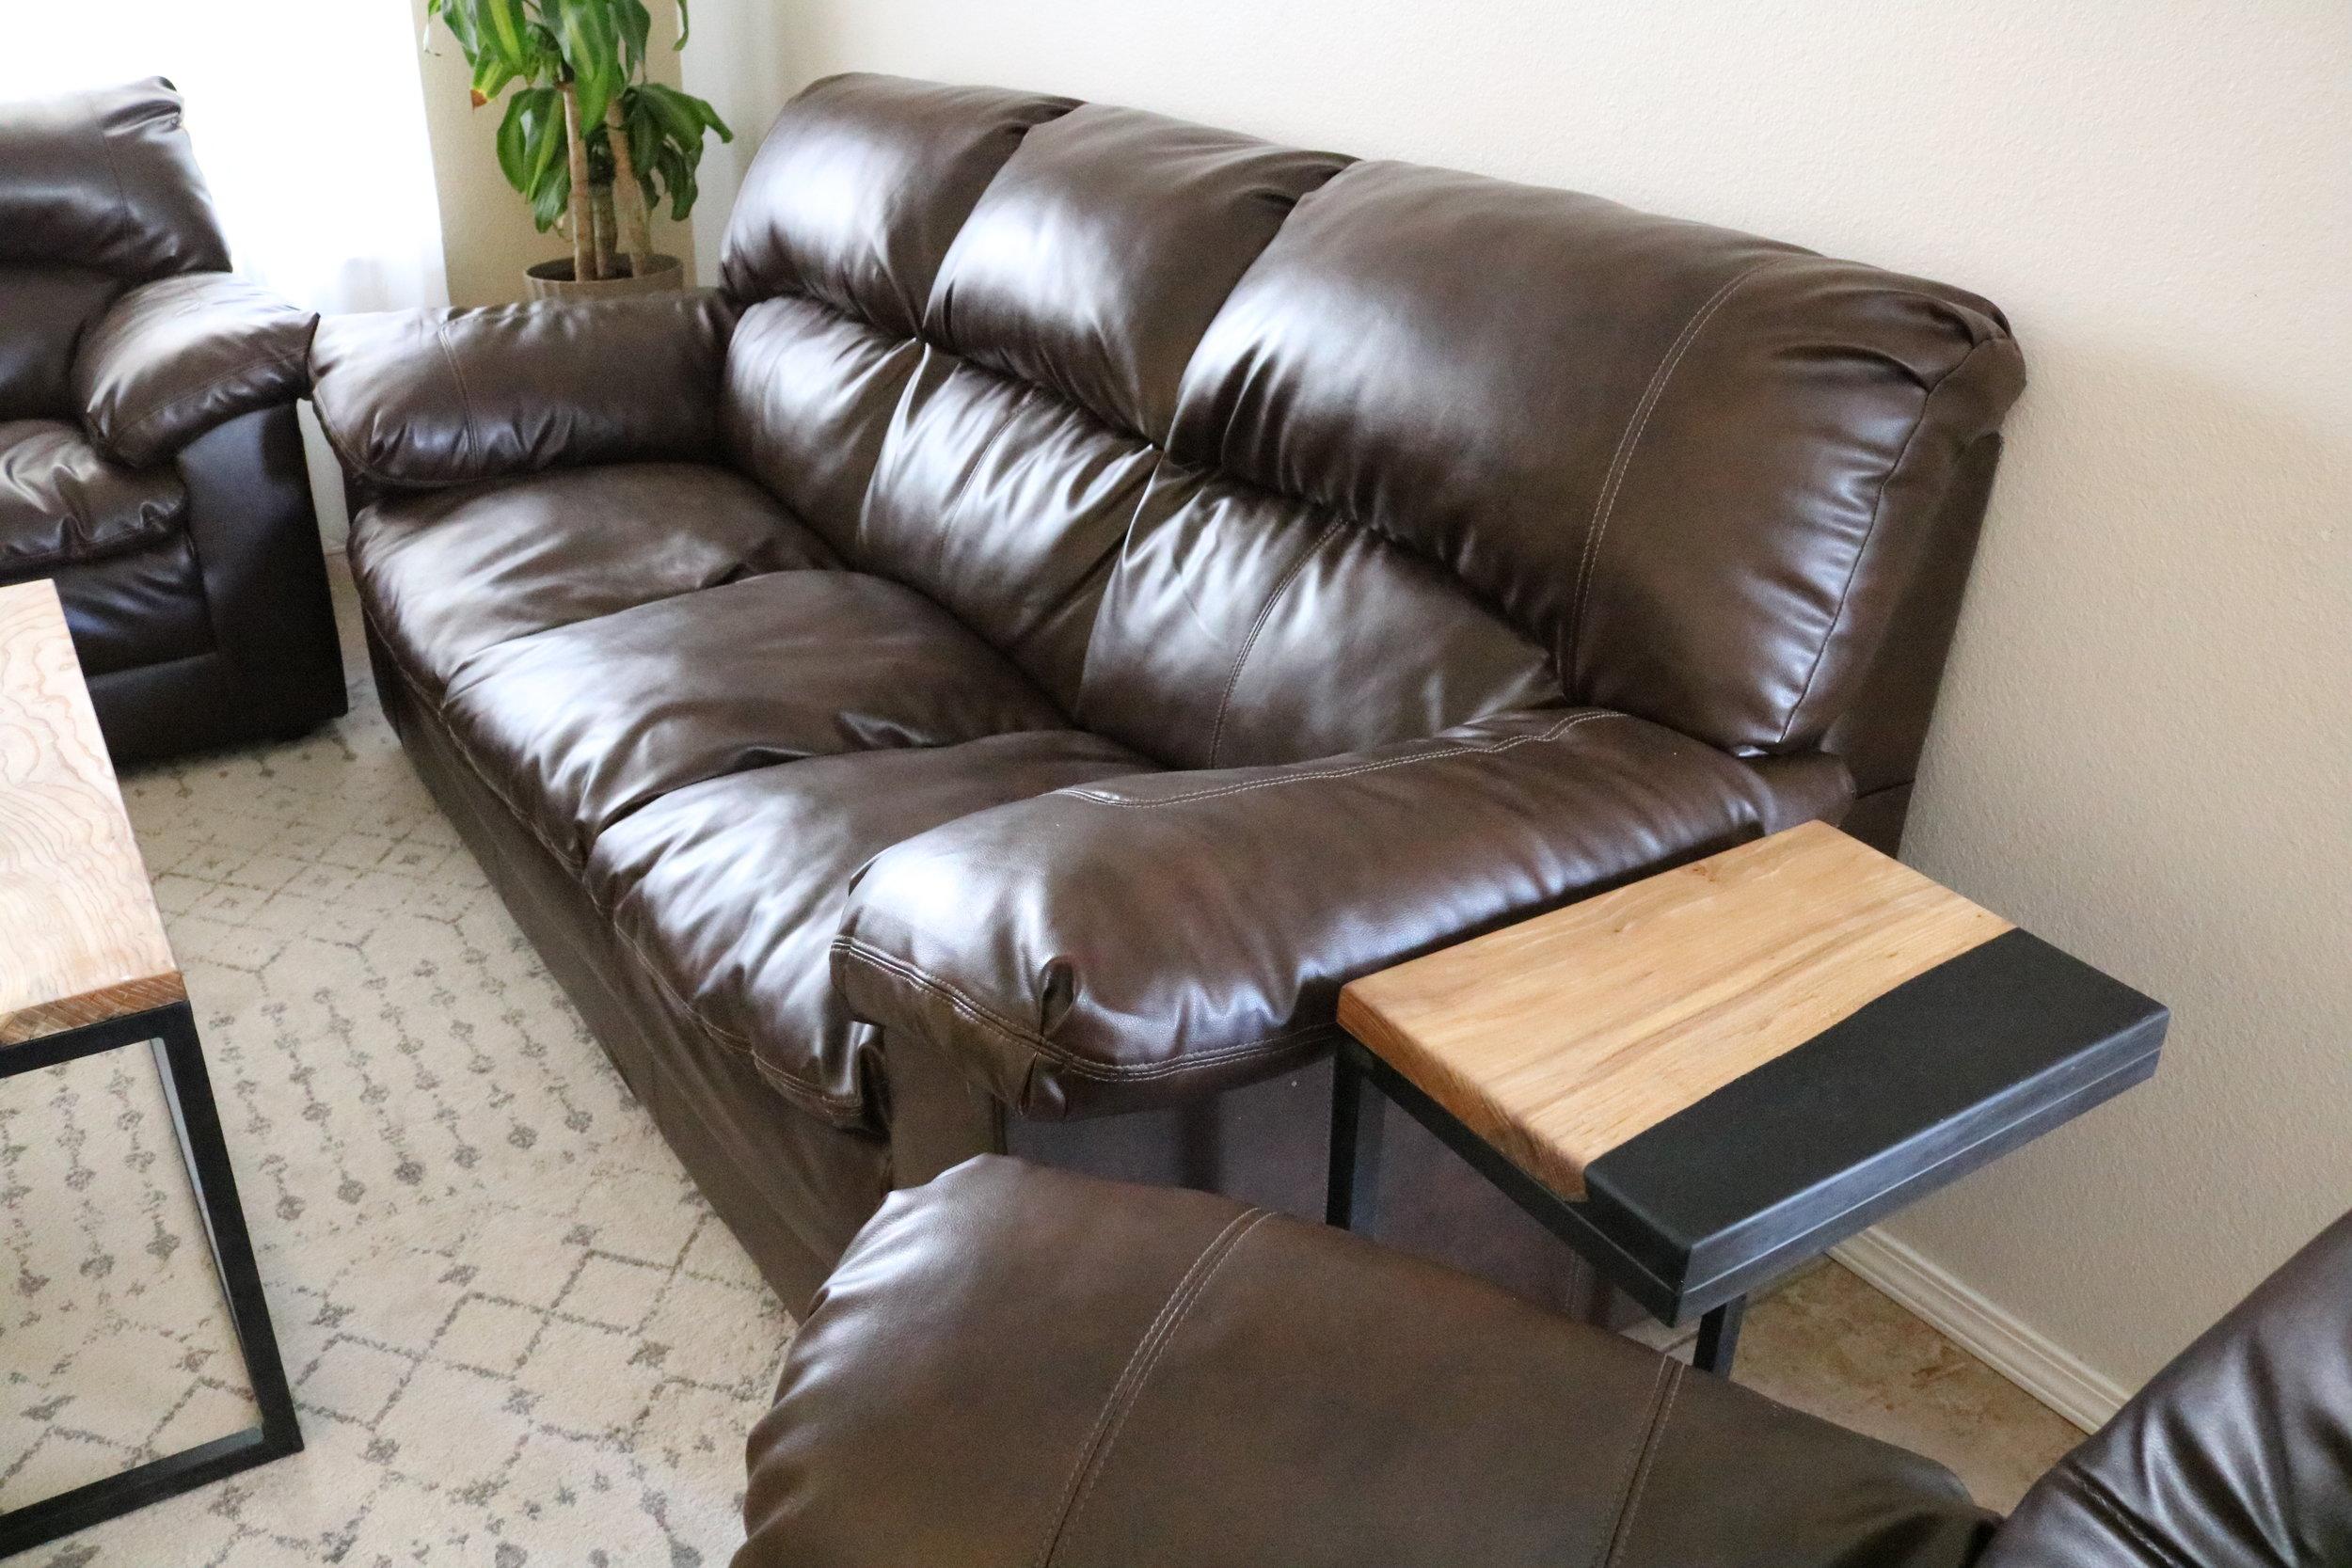 modern-end-table-metal-and-wood.JPG